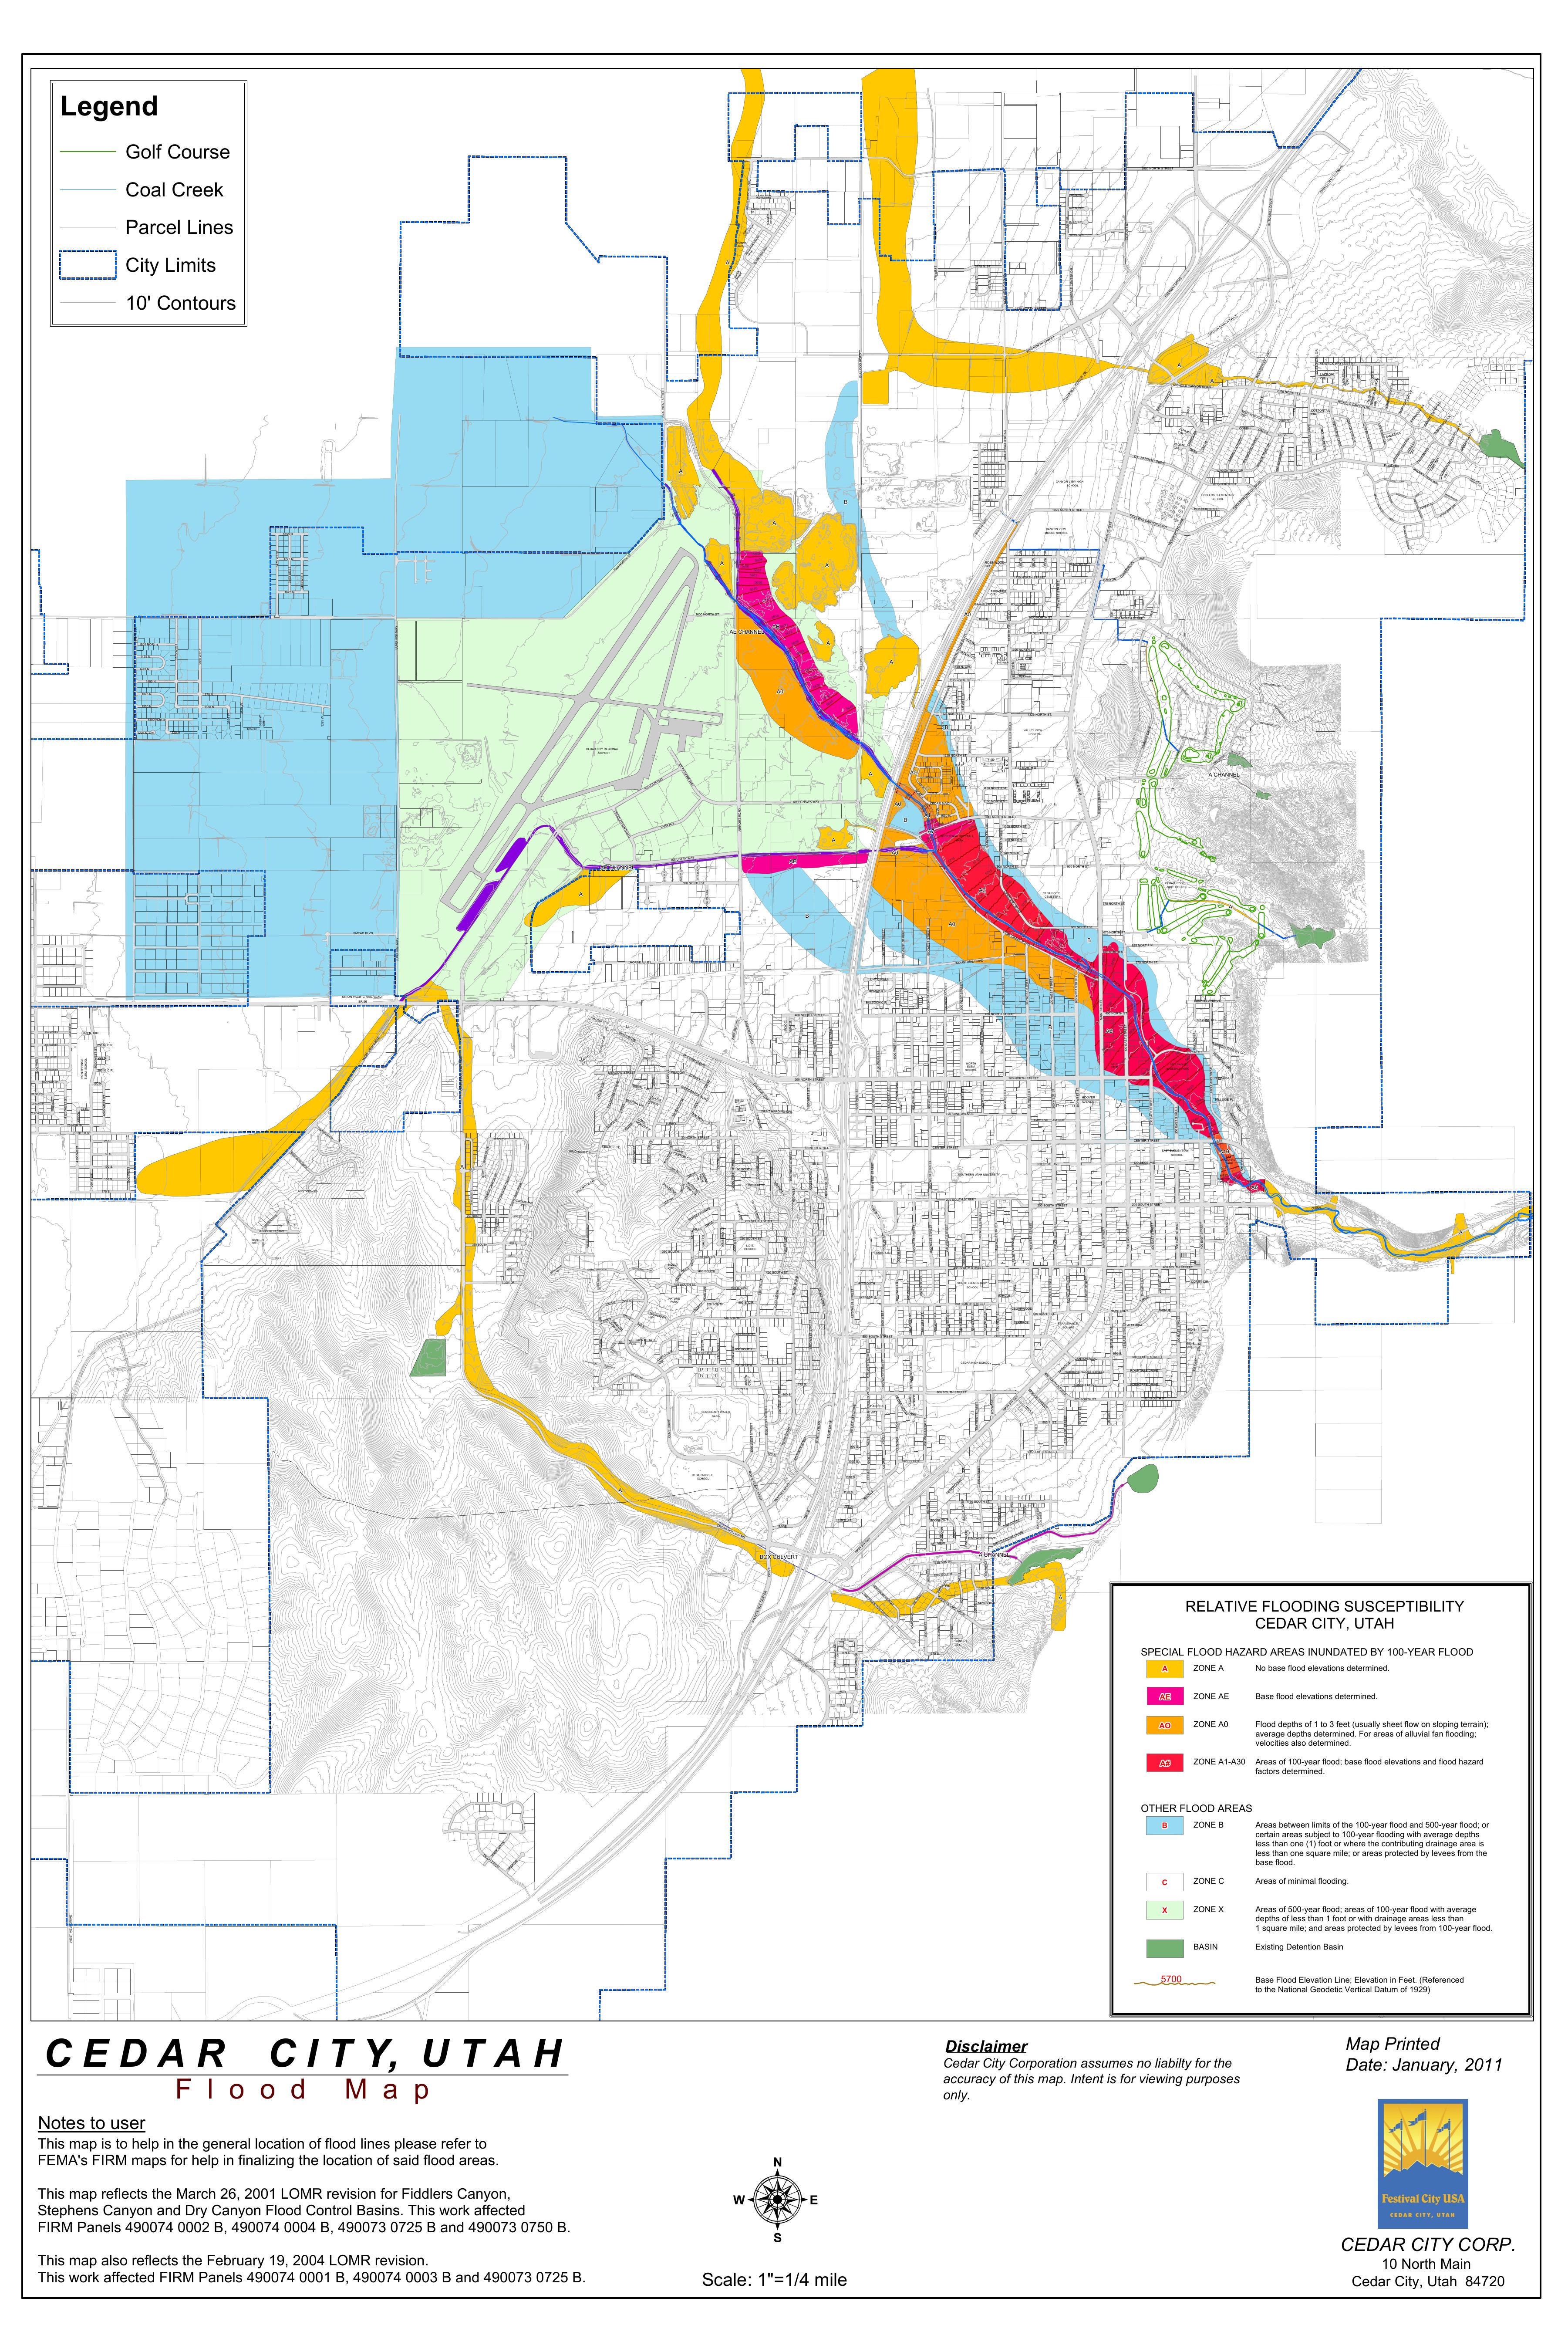 FEMA Flood Zones